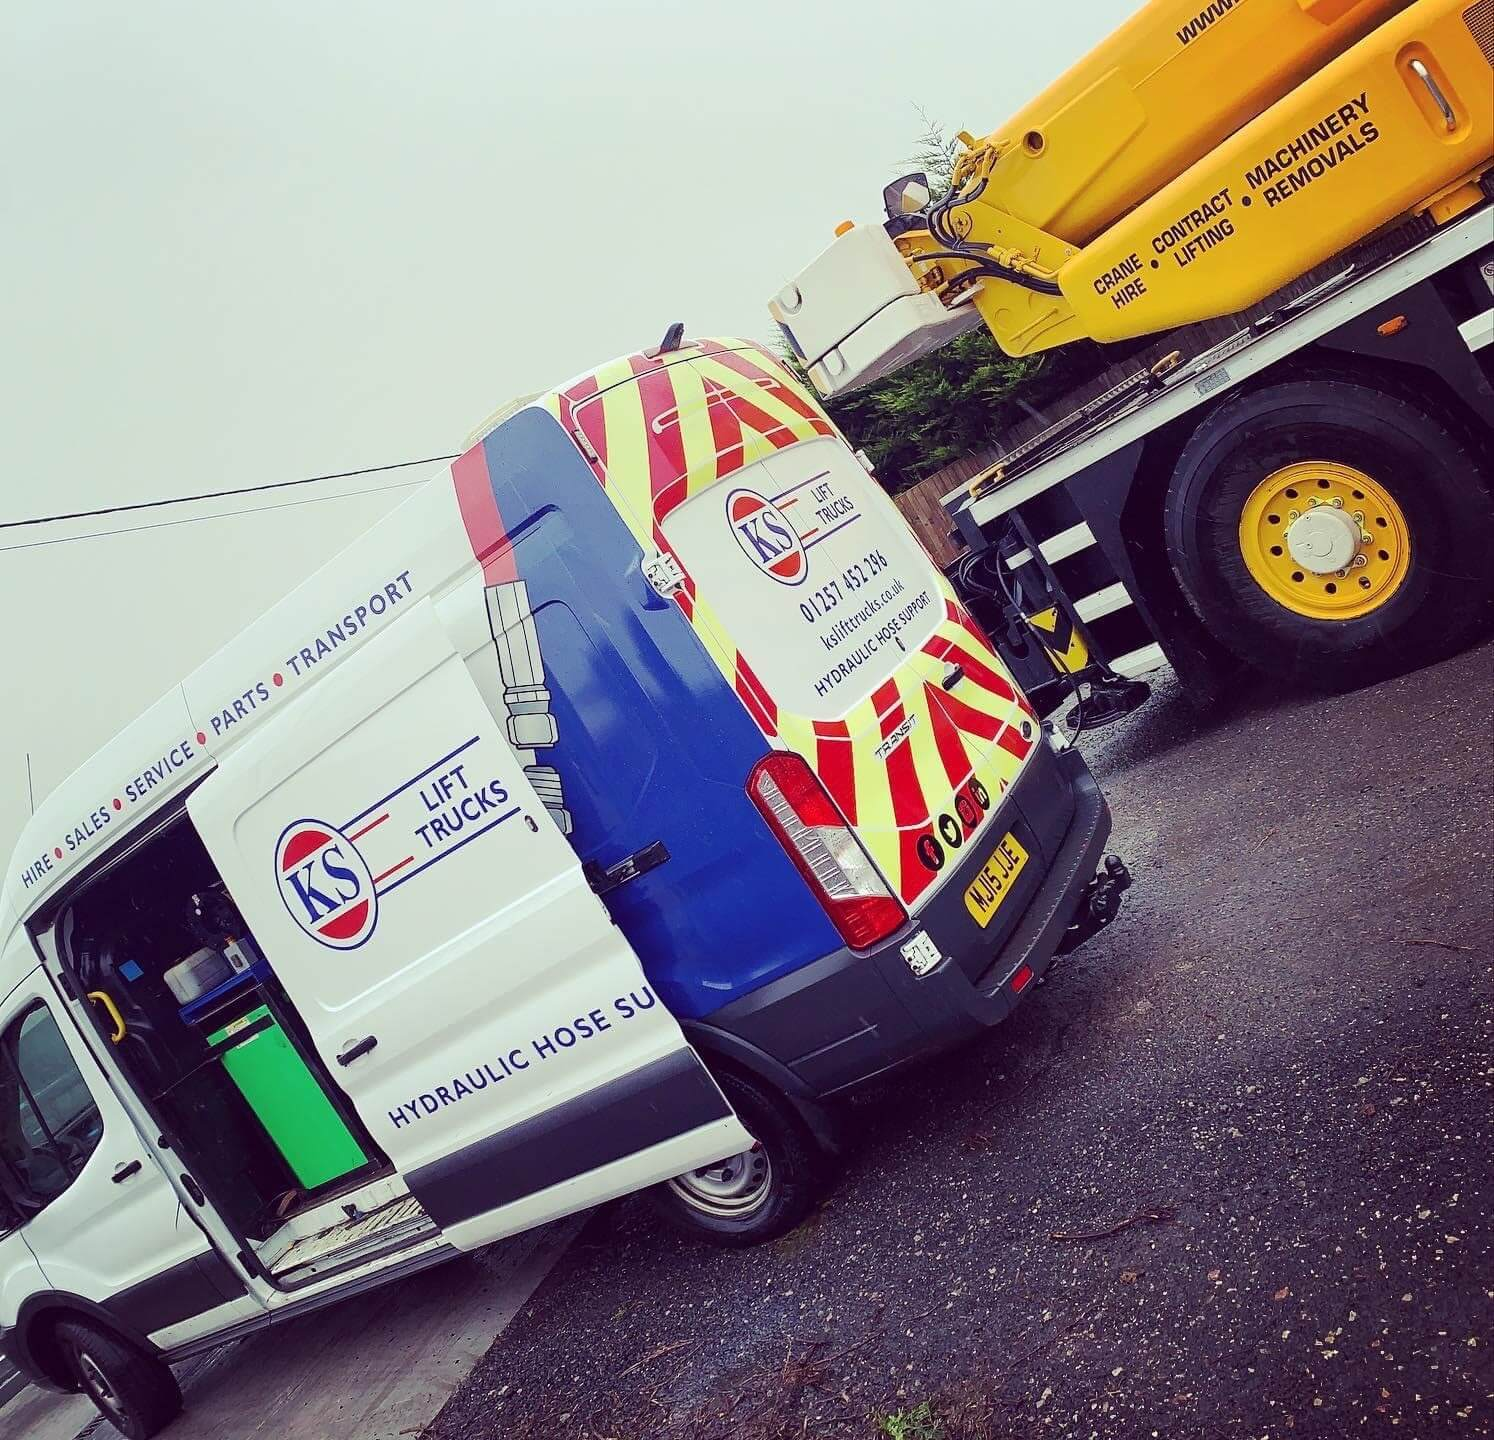 KS lift trucks delivery vehicles